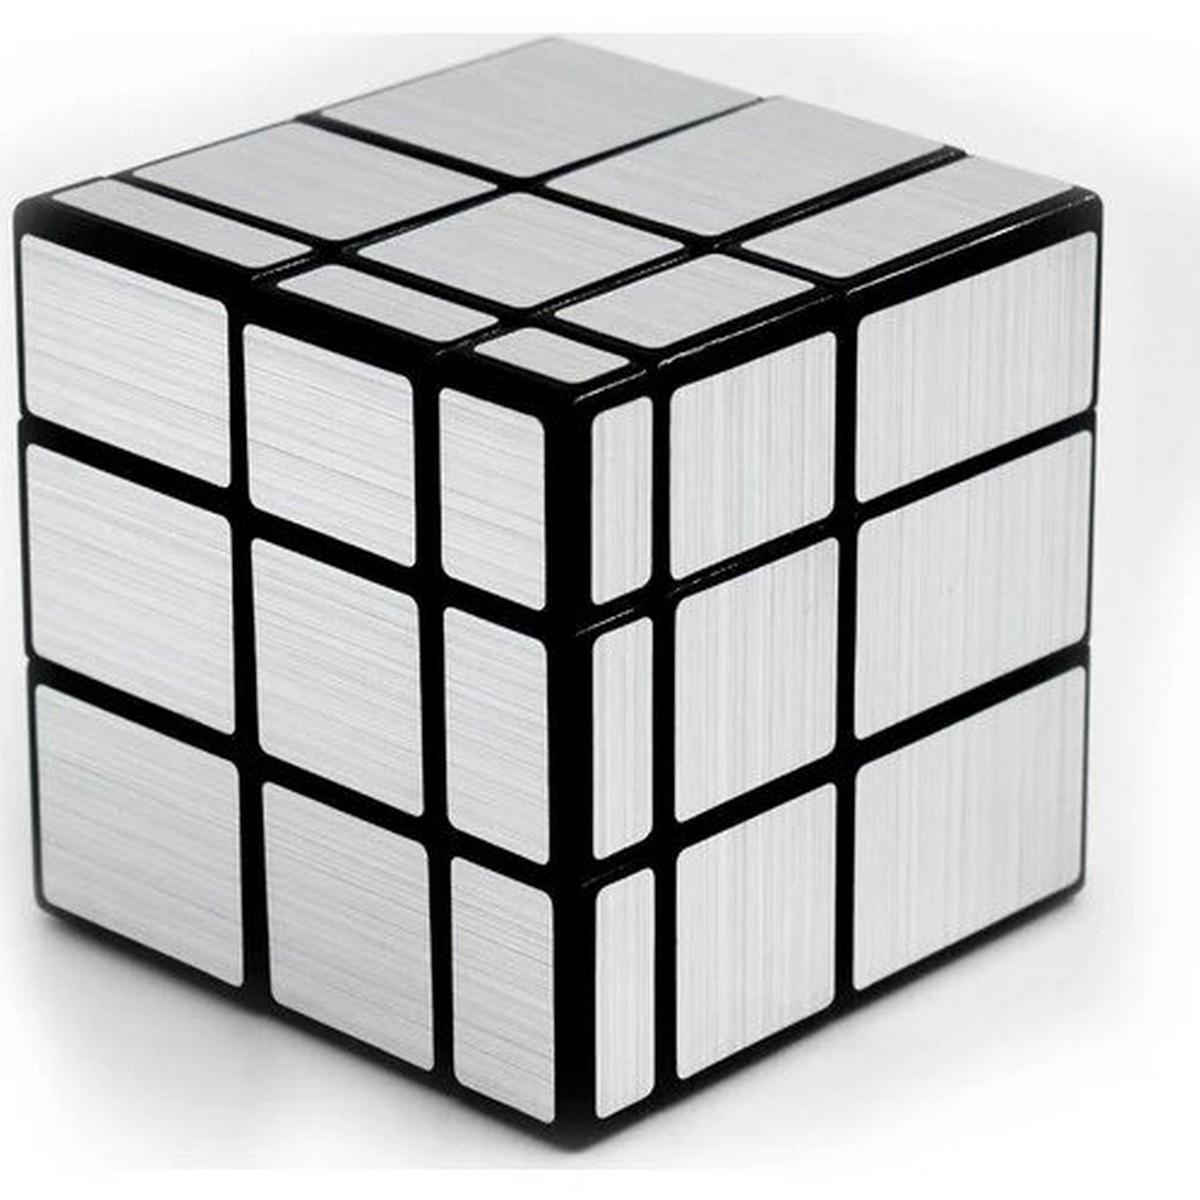 Original QIYI Mirror Rubiks Cube - Rubik's Cube for Kids - Silver -  Very Smooth 3x3x3 Rubics Magic Speed Cube Puzzle Toys for Children Shape Block